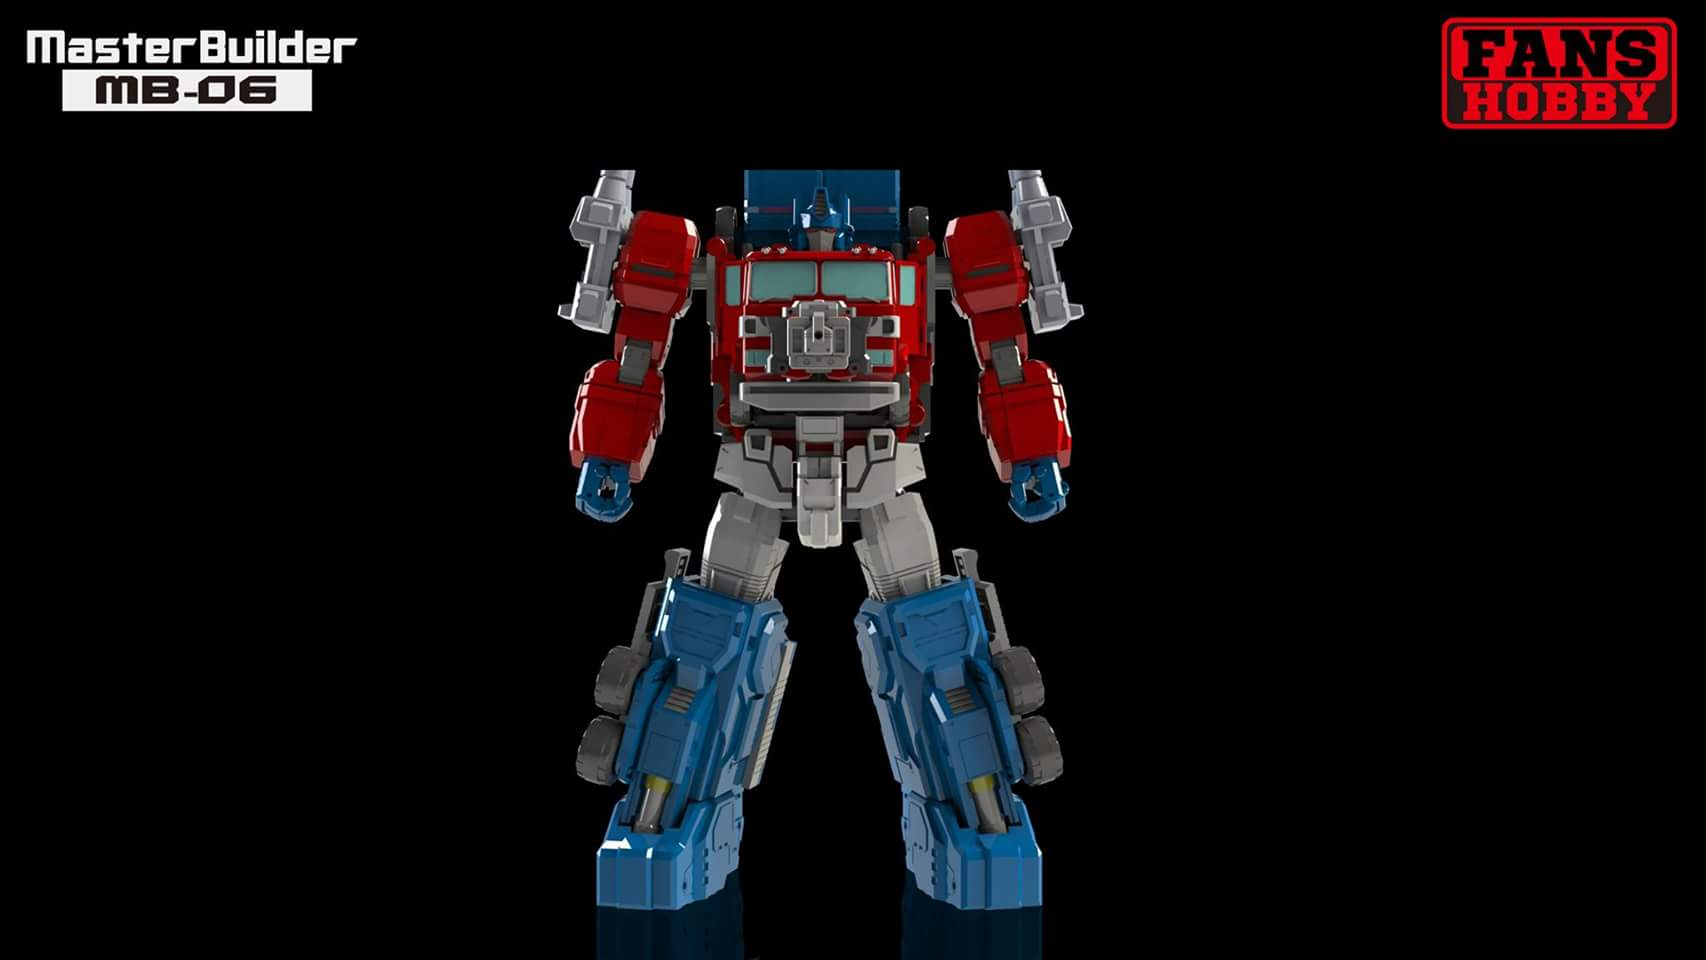 [FansHobby] Produit Tiers - MB-06 Power Baser (aka Powermaster Optimus) + MB-11 God Armour (aka Godbomber) - TF Masterforce Dp9BwWs9